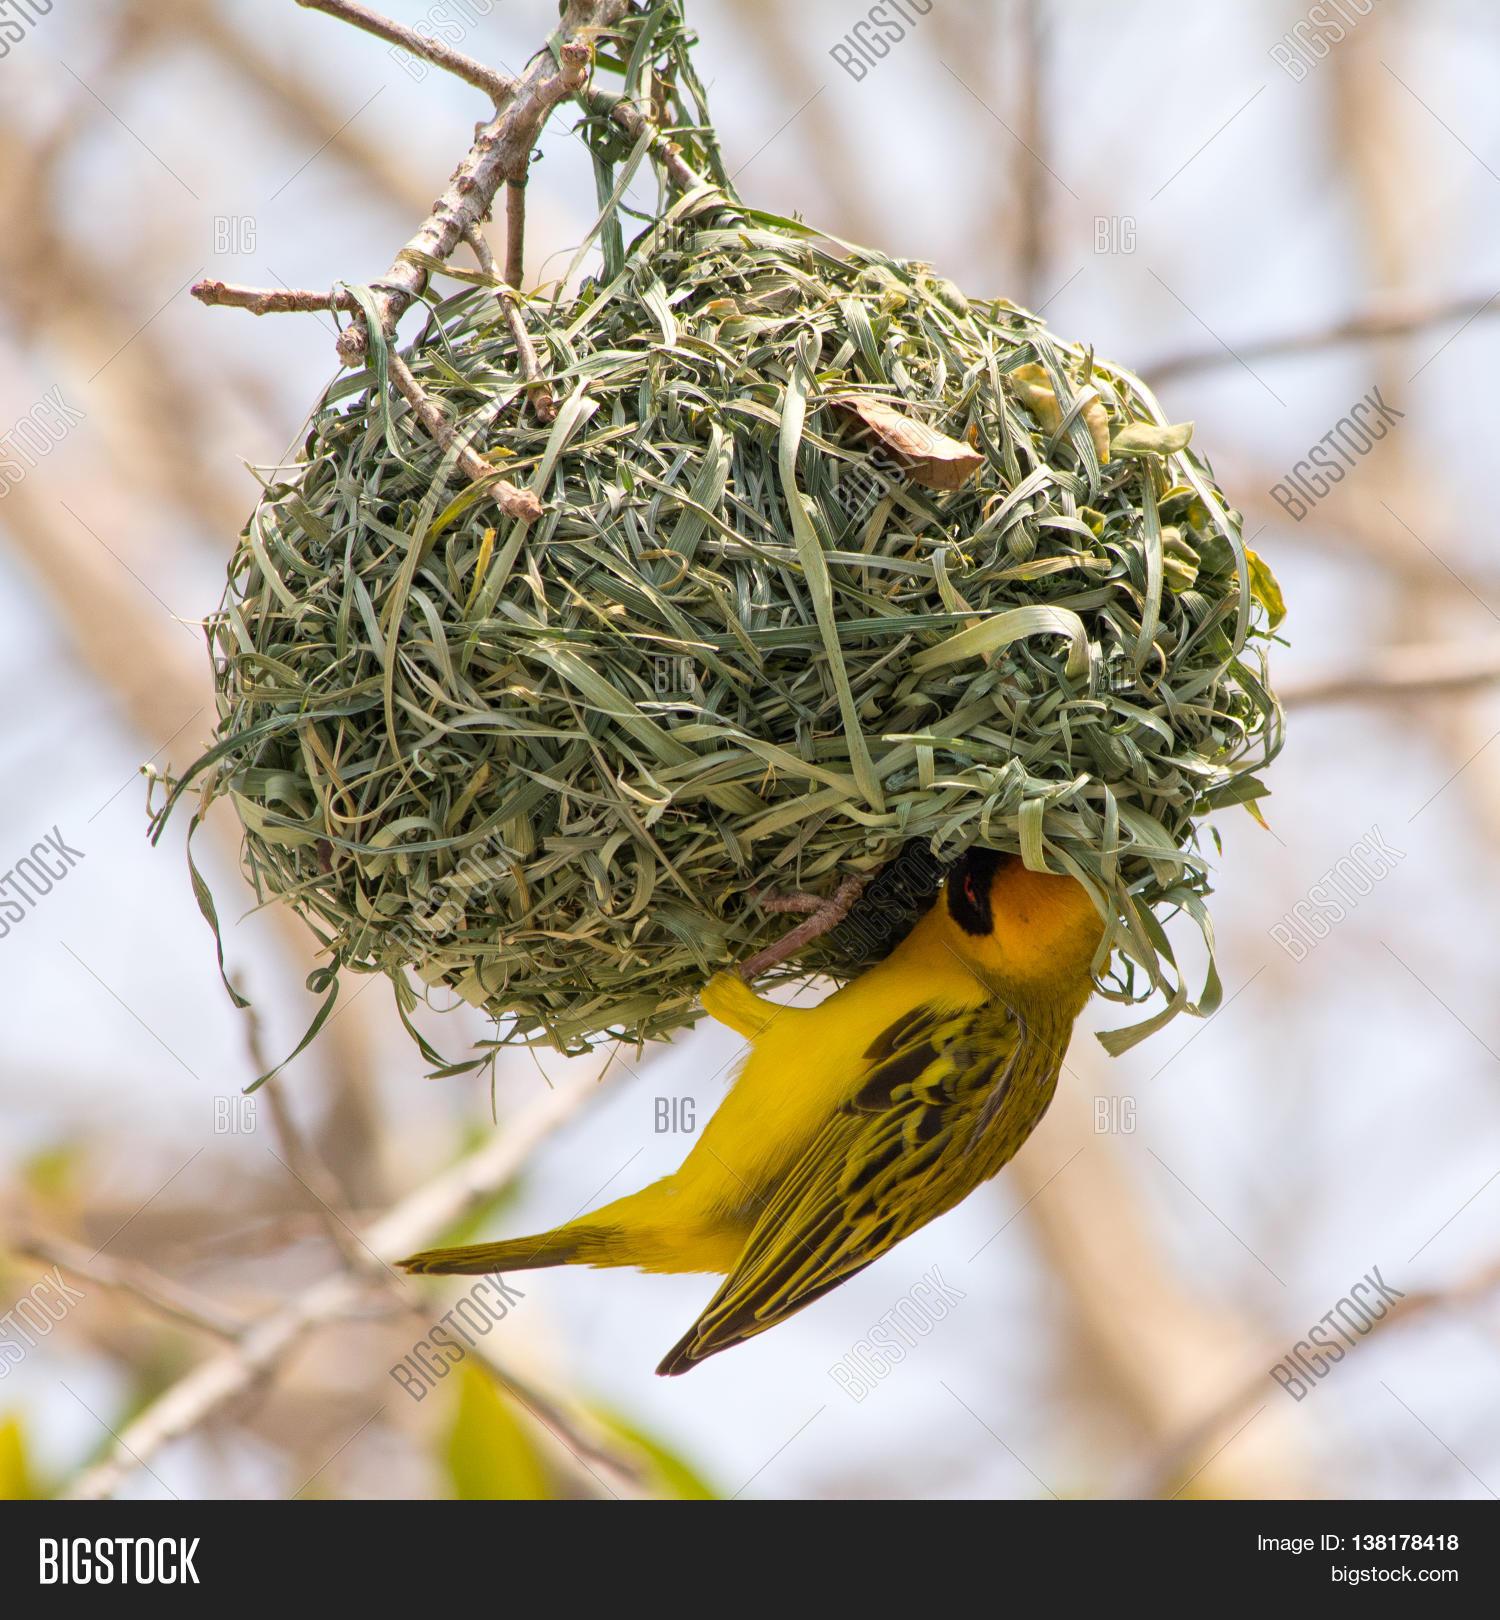 Yellow Masked Weaver Image Photo Free Trial Bigstock